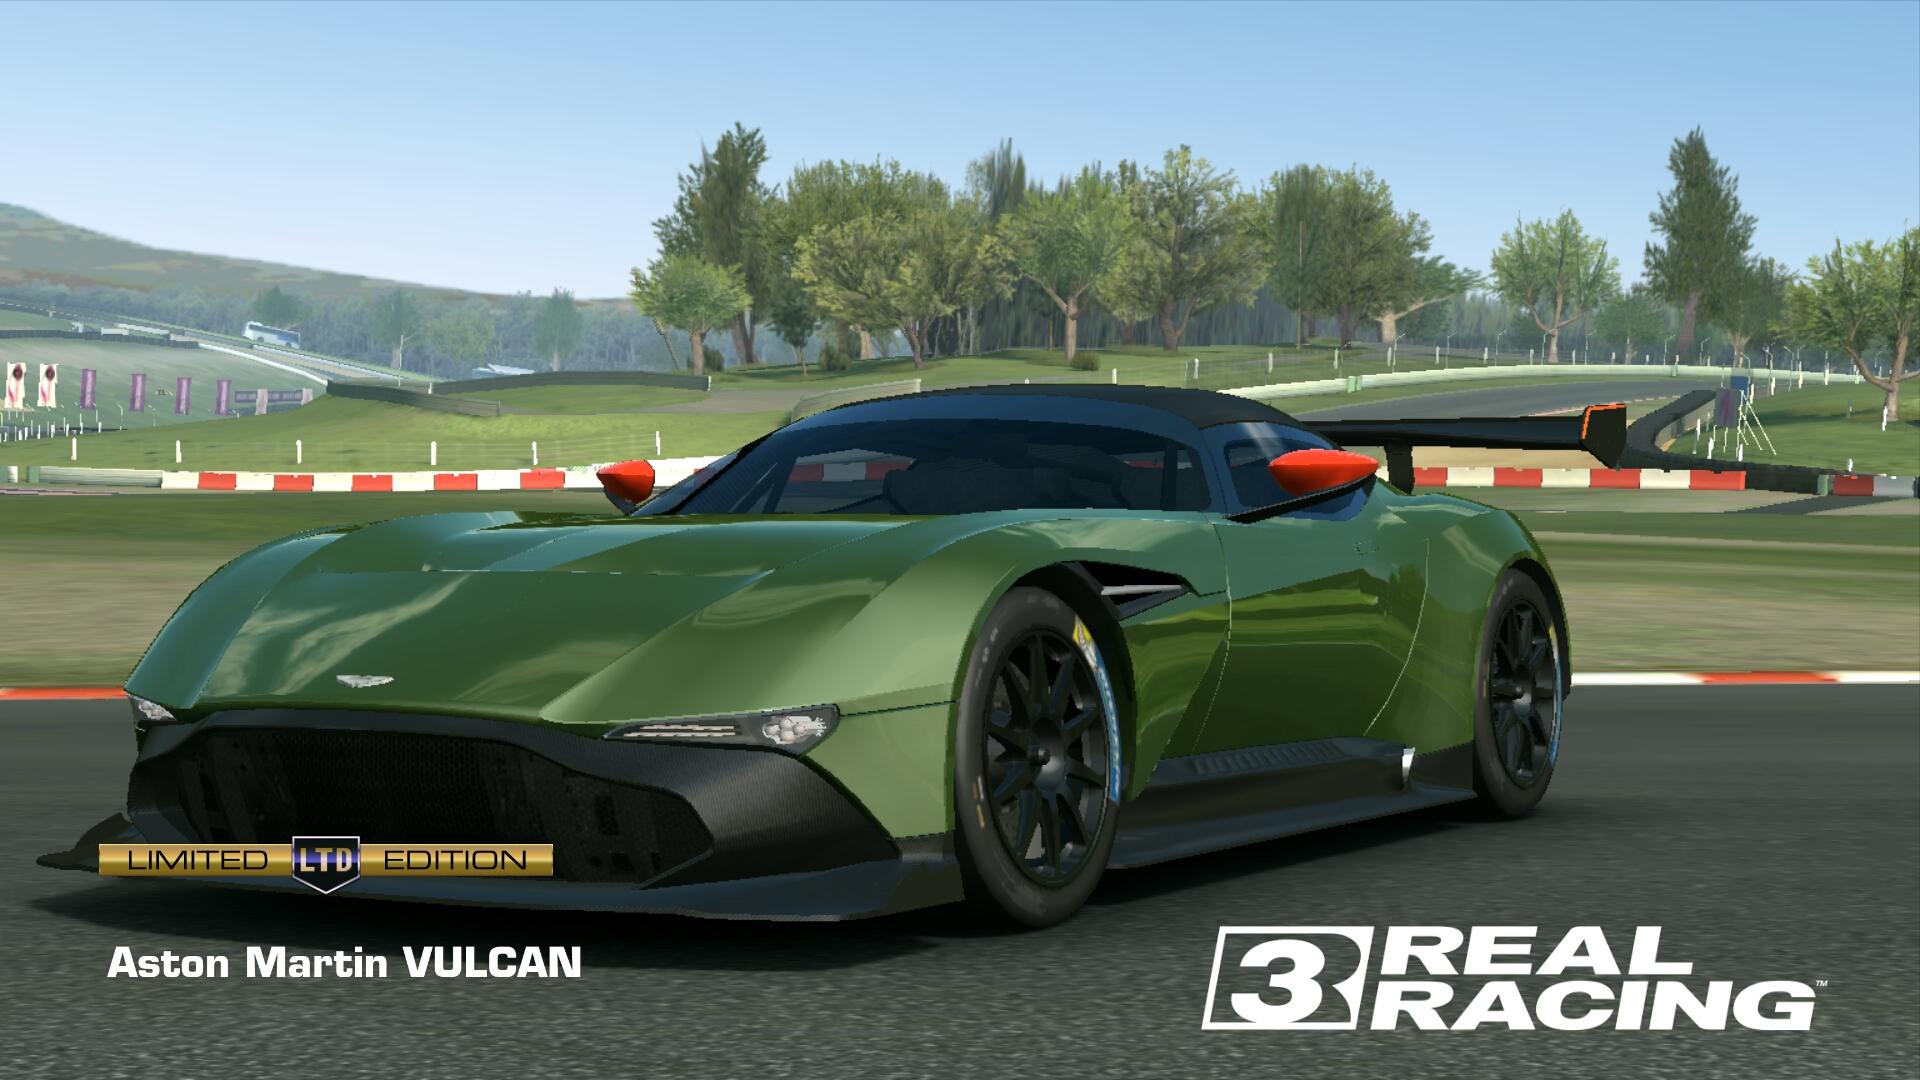 Image Showcase Aston Martin Vulcan Jpg Real Racing 3